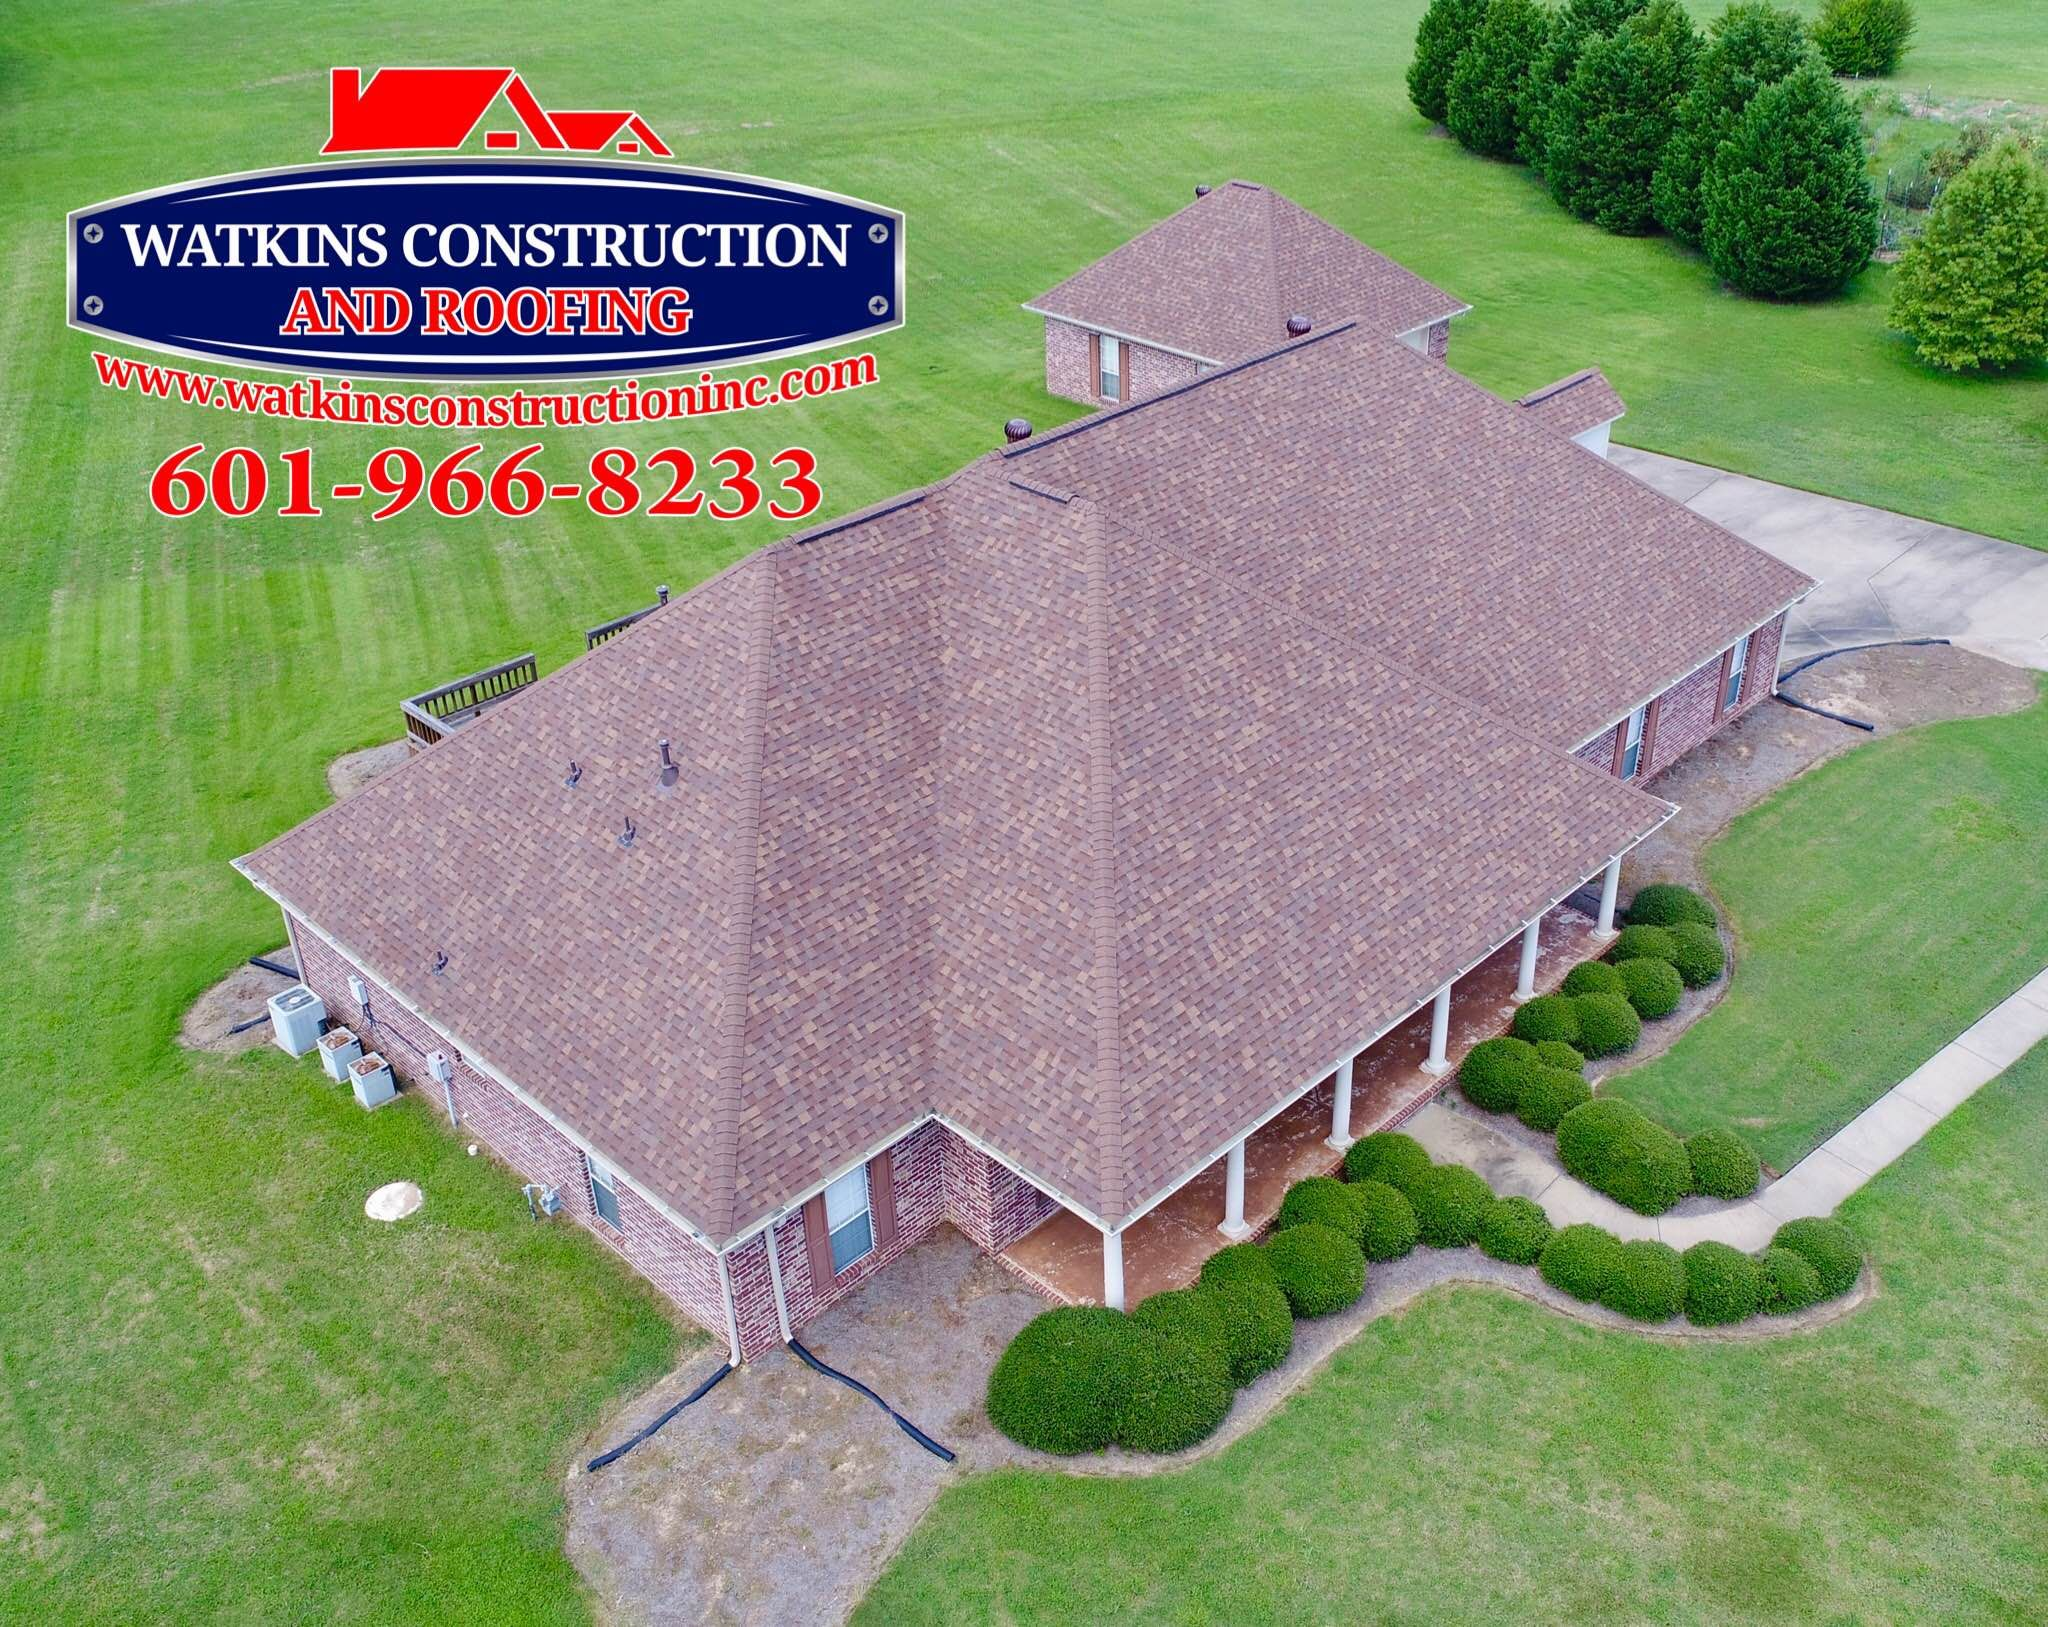 Check Out This Owens Corning Oakridge Artisan Aged Cedar Roof Learn More At Www Watkinsconstructioninc Com Ocplati Cedar Roof Aerial Photo Outdoor Blanket